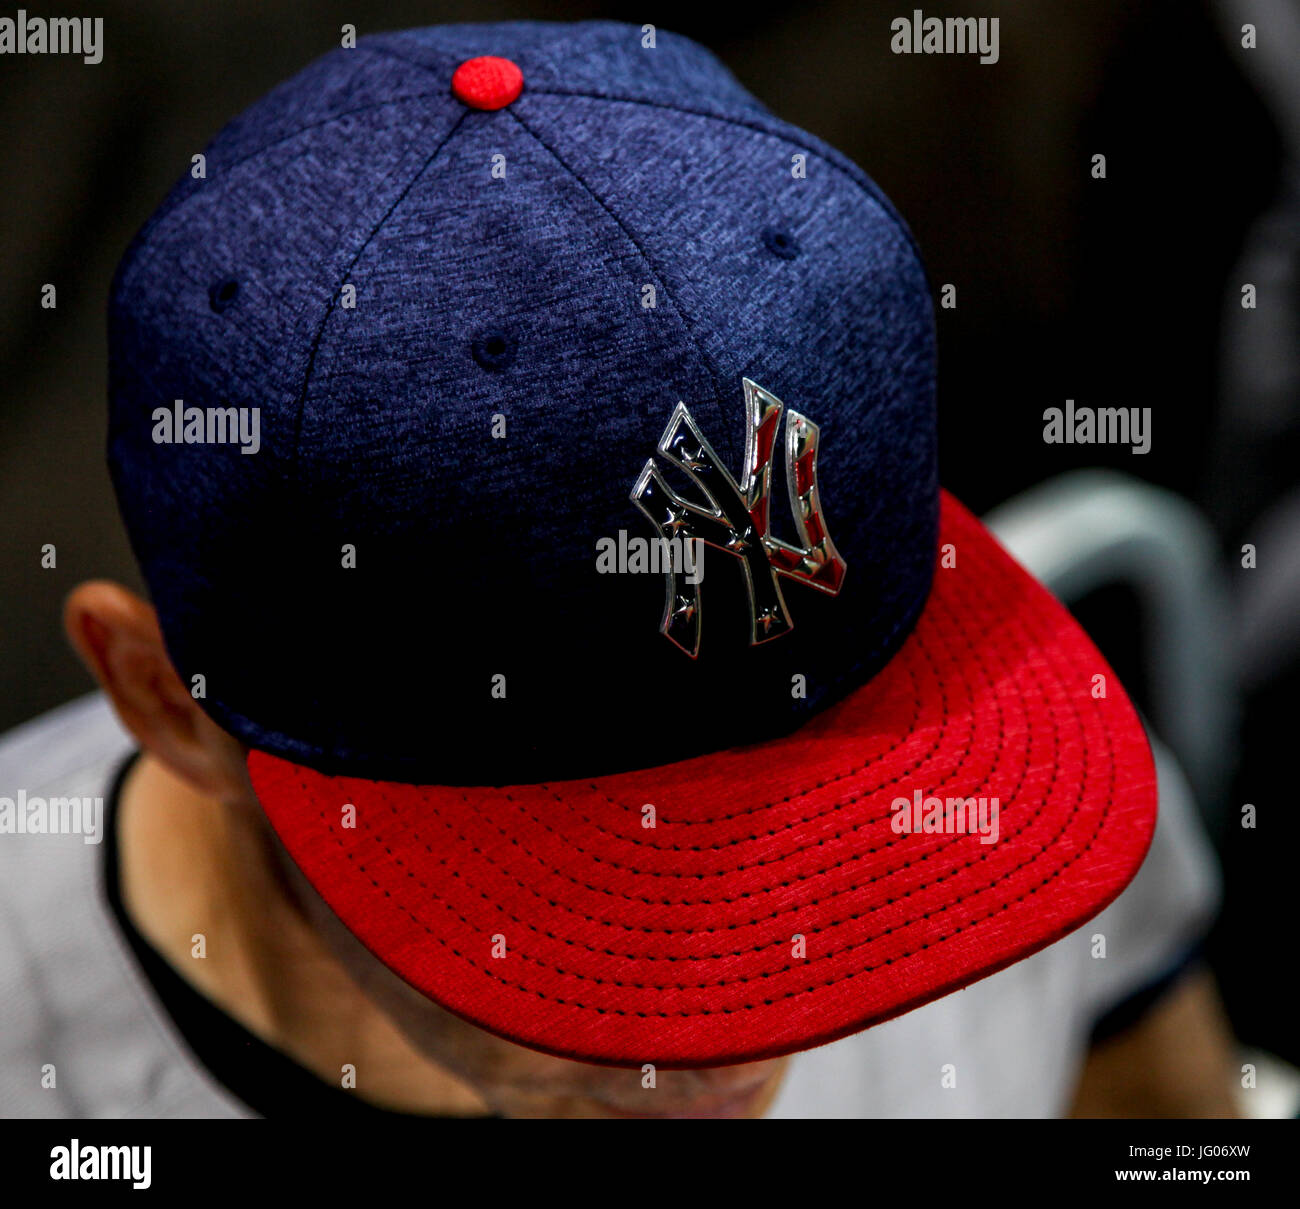 30c5f55cf1b New York Yankees Hat Stock Photos   New York Yankees Hat Stock ...